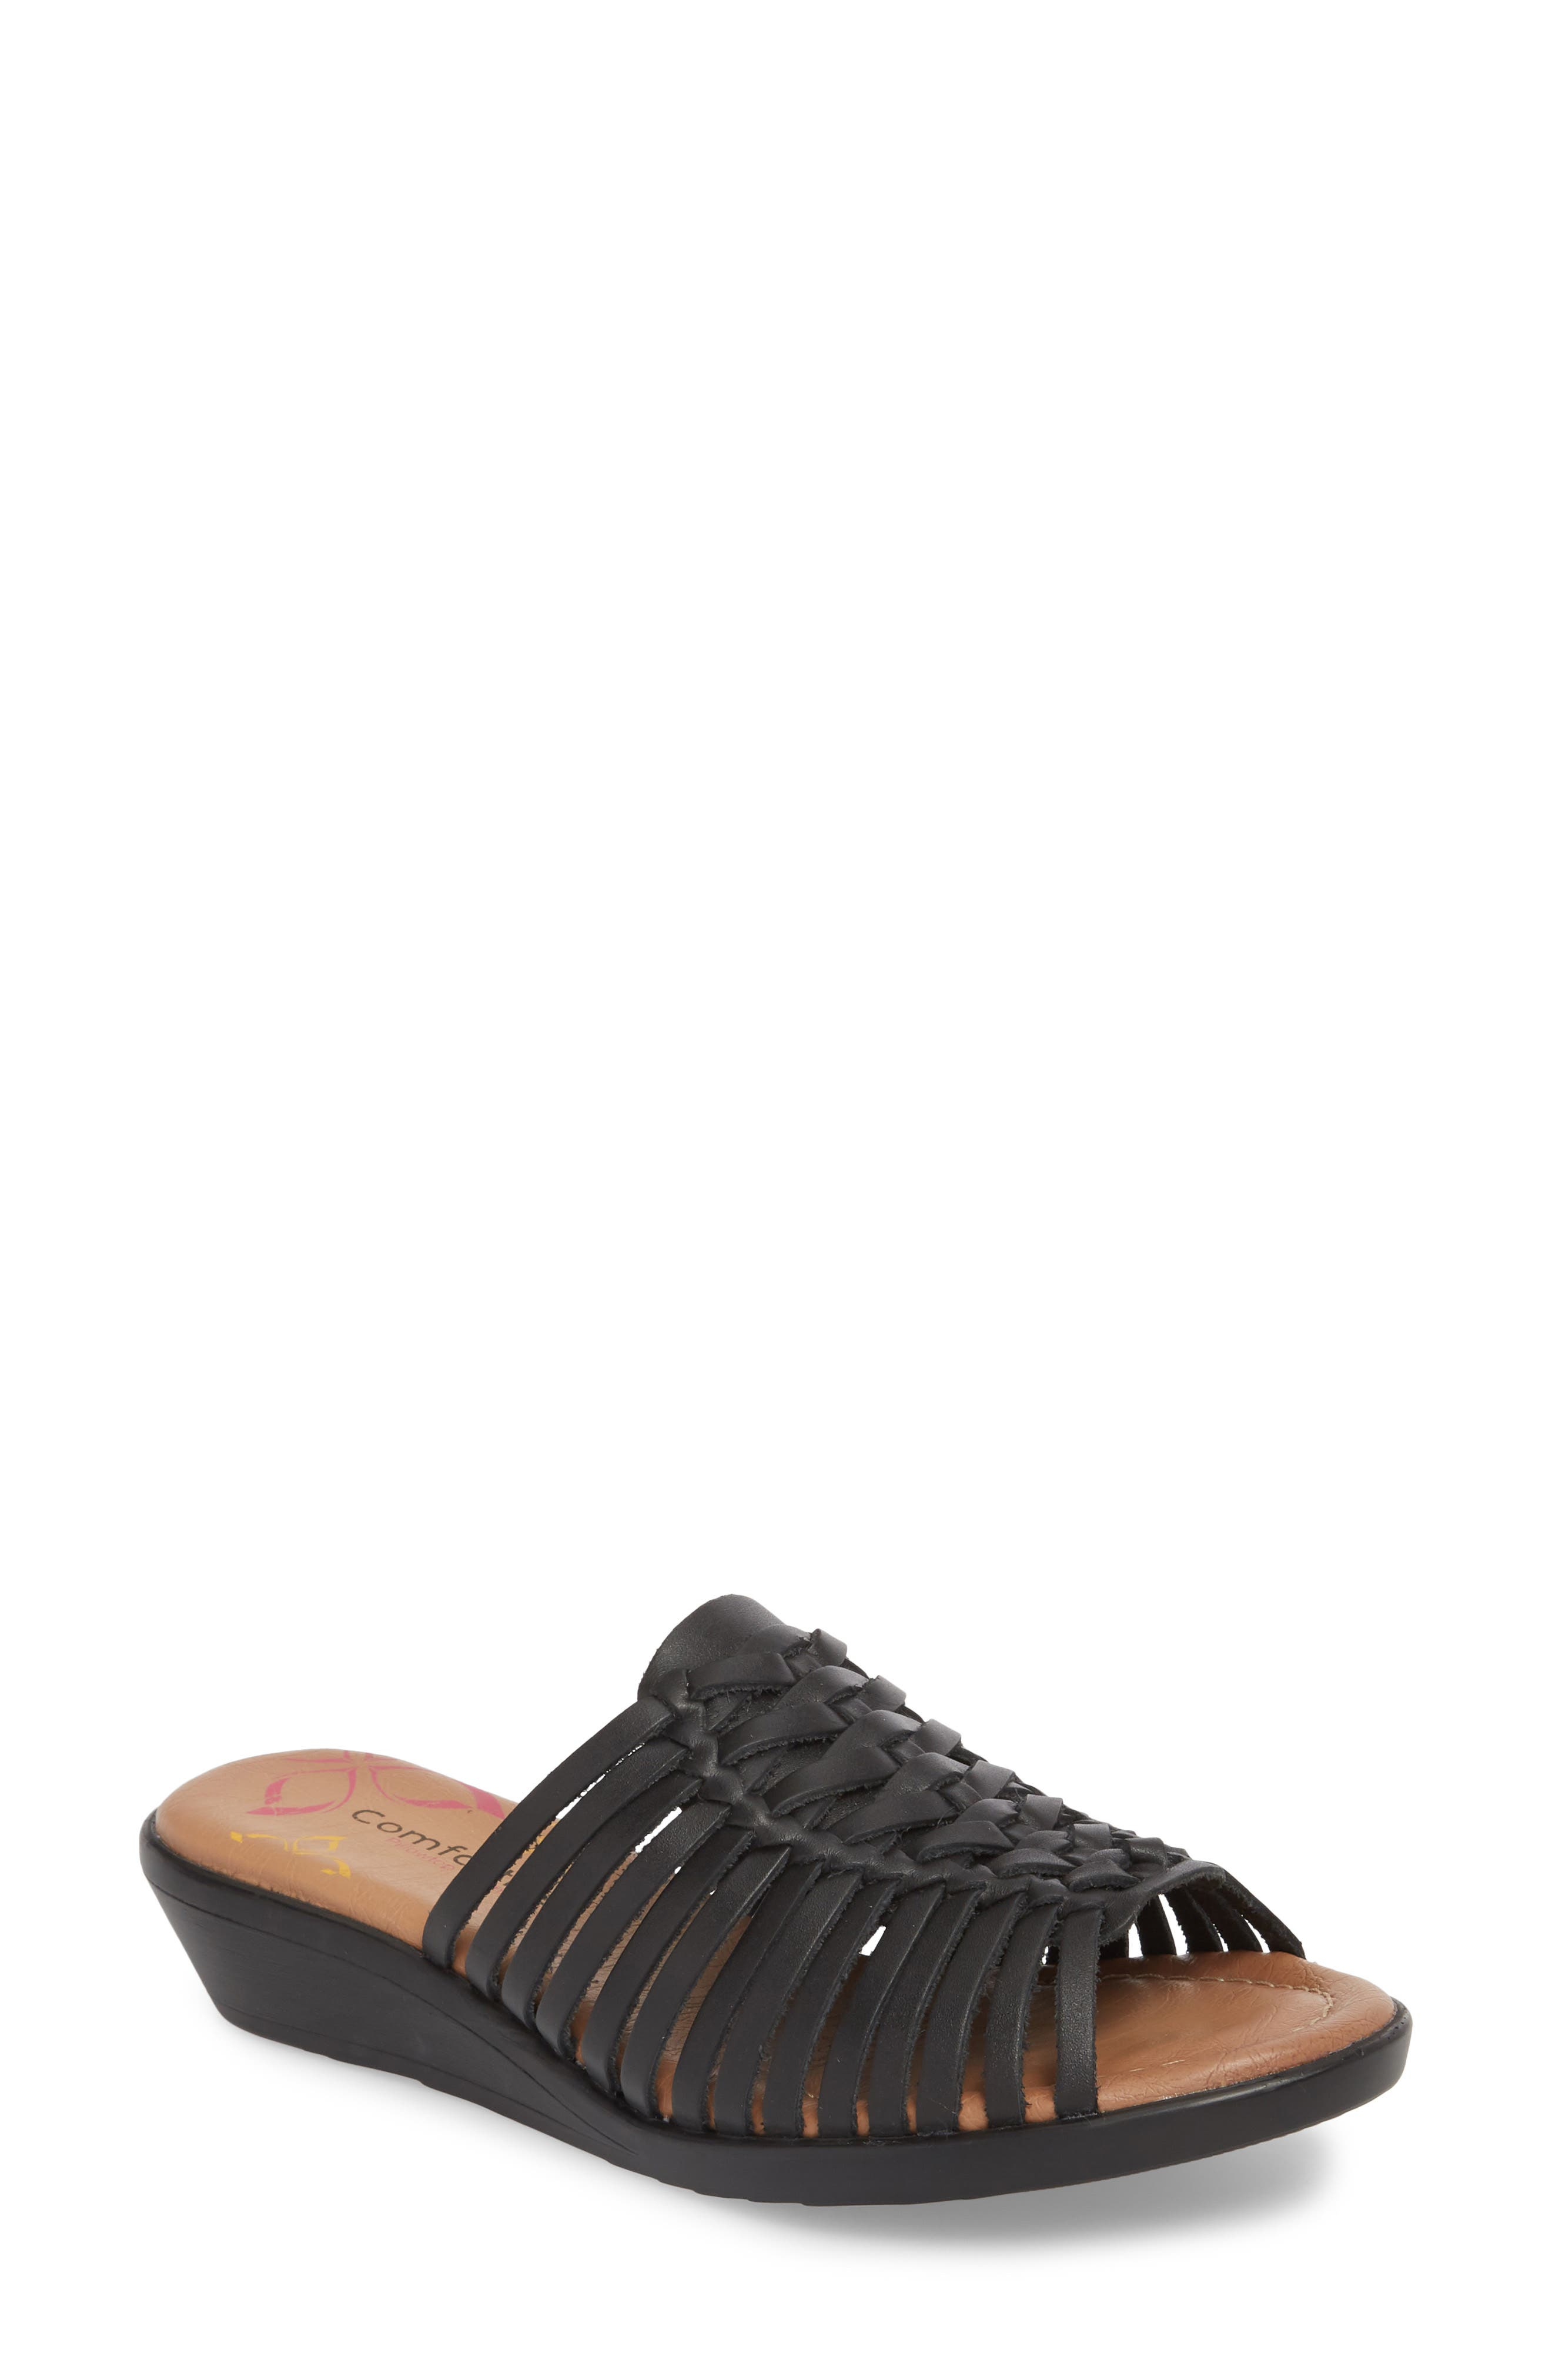 COMFORTIVA Felida Huarache Slide Sandal, Main, color, BLACK LEATHER